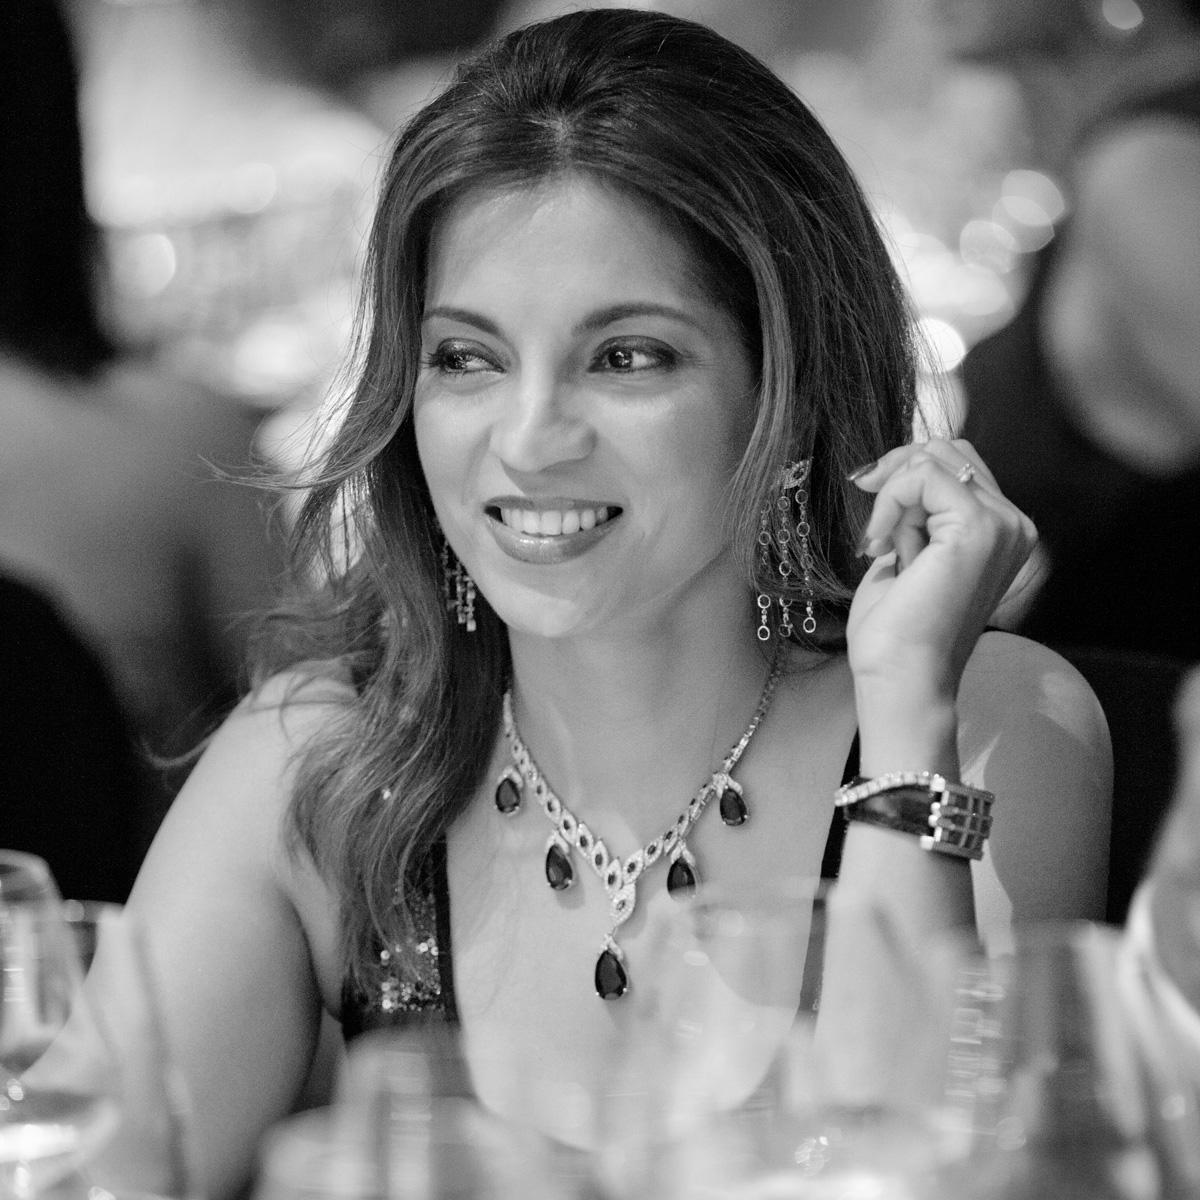 Chopard Gala Dinner, China, Hainan, Event Photography, Millionairess